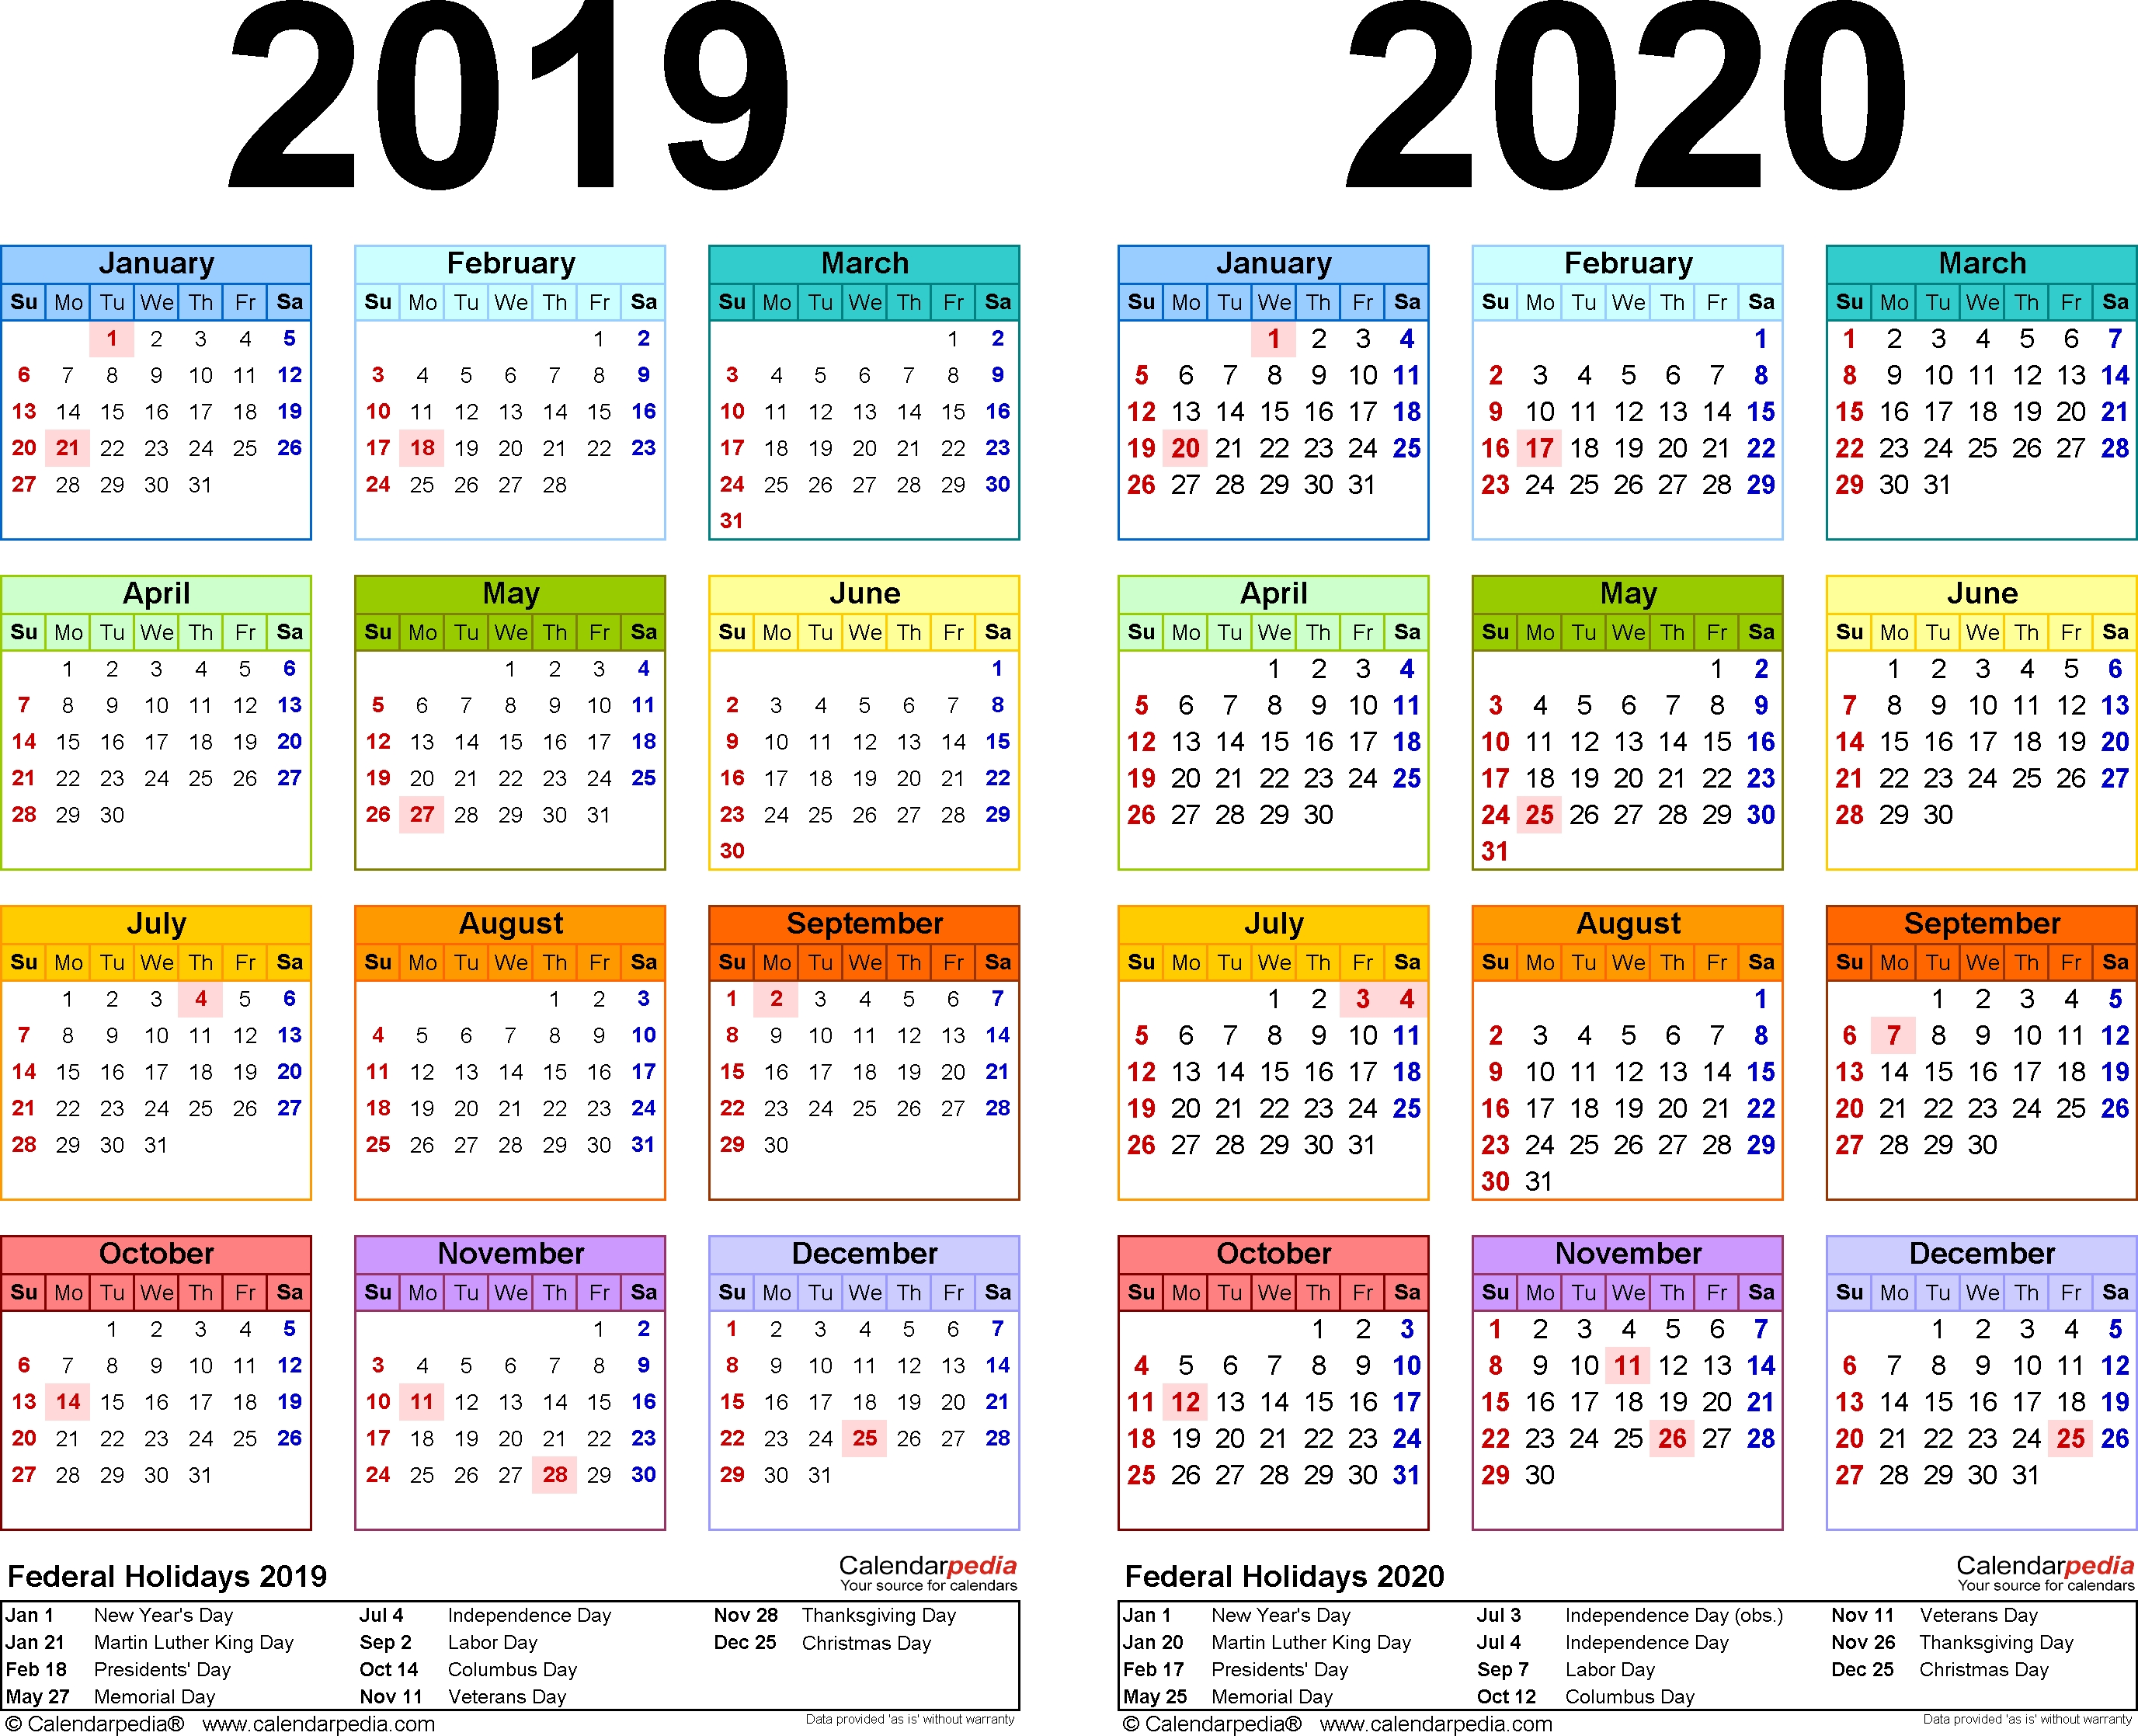 2019 2020 School Year Calendar With Holiday Us - Google